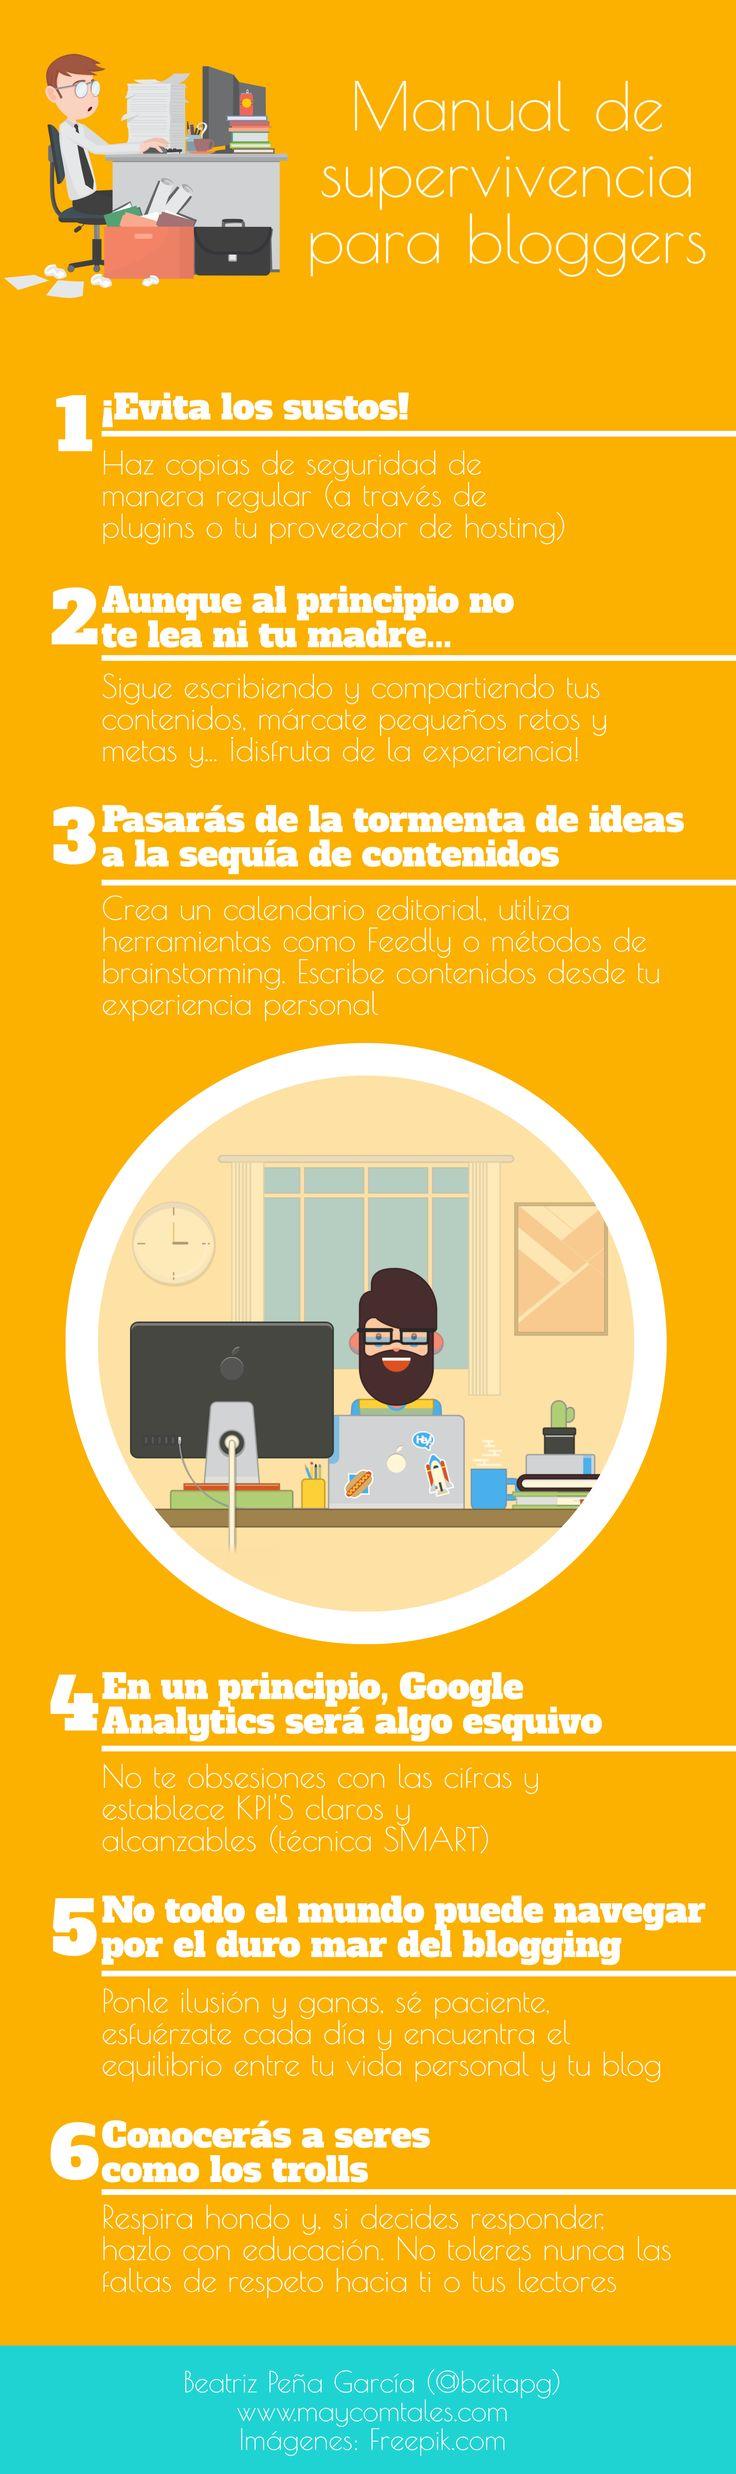 Manual de supervivencia para Bloggers #infografia